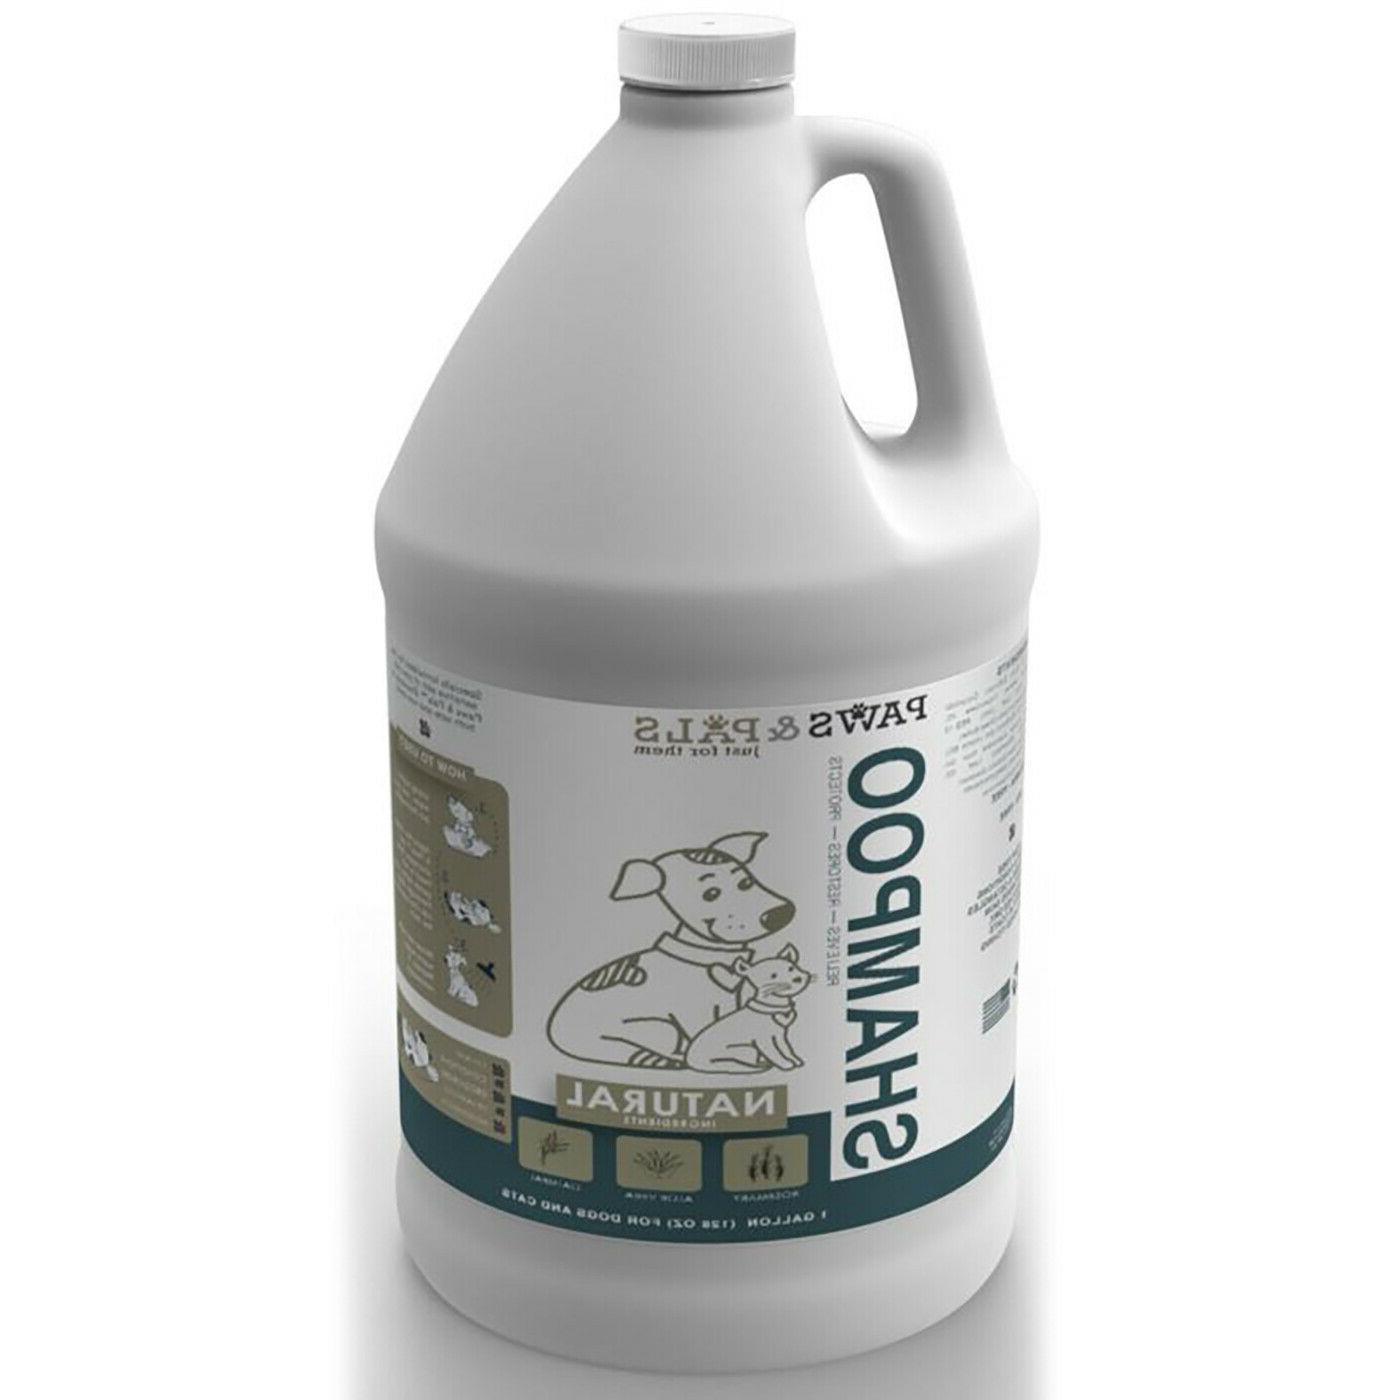 Dog Shampoo Dry Itchy Sensitive - Natural Shampoo Gallon